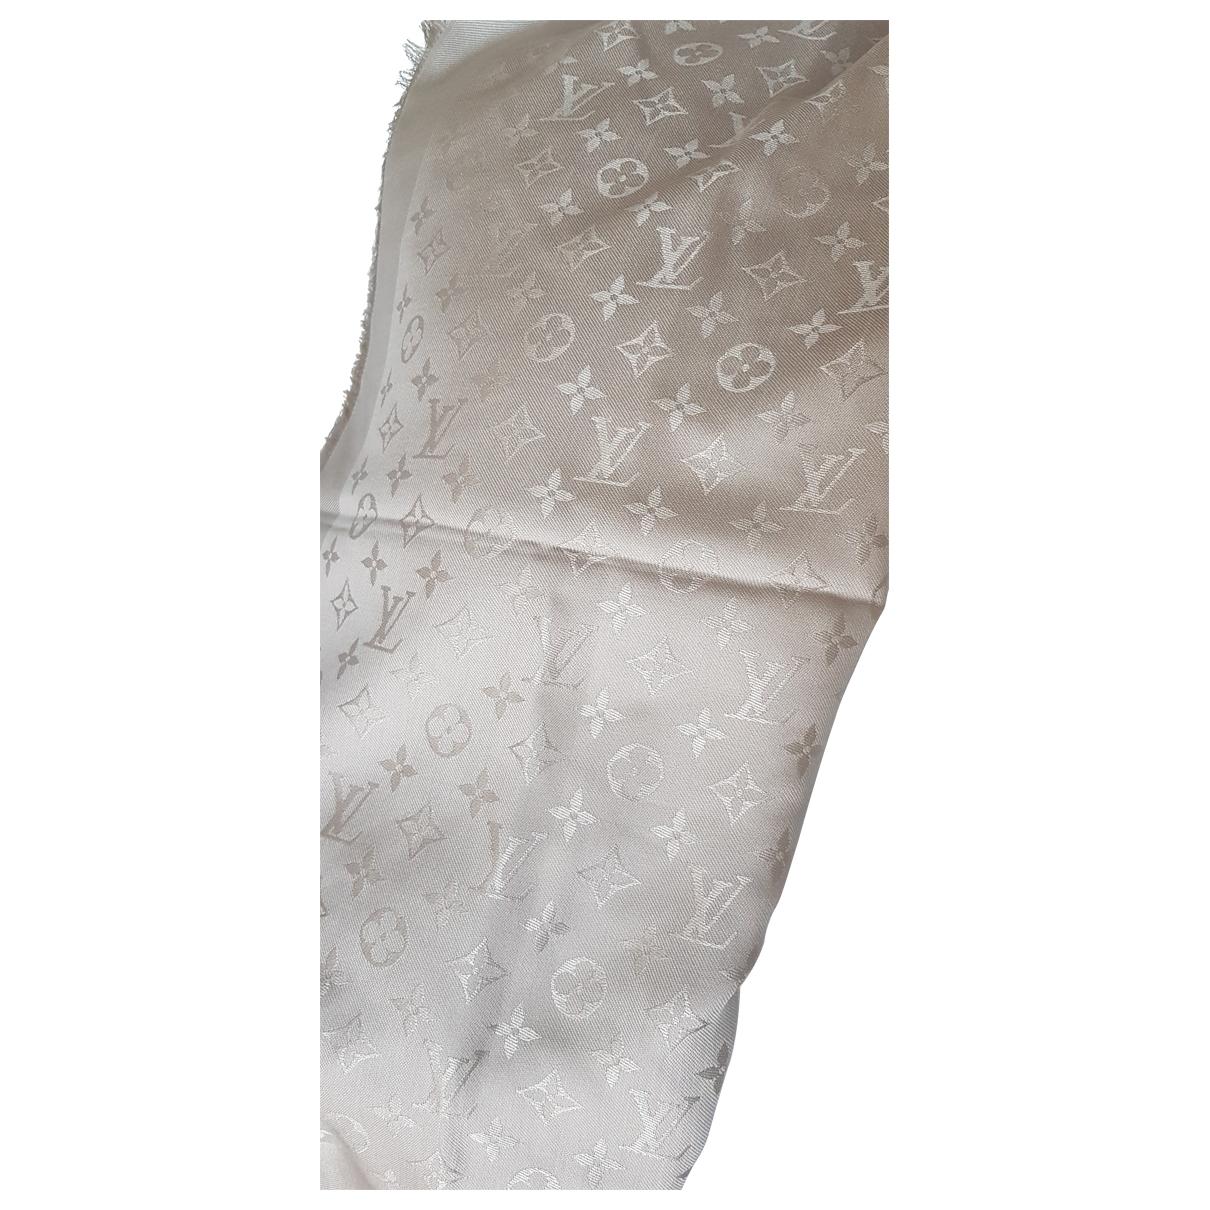 Louis Vuitton Chale Monogram Schal Grau